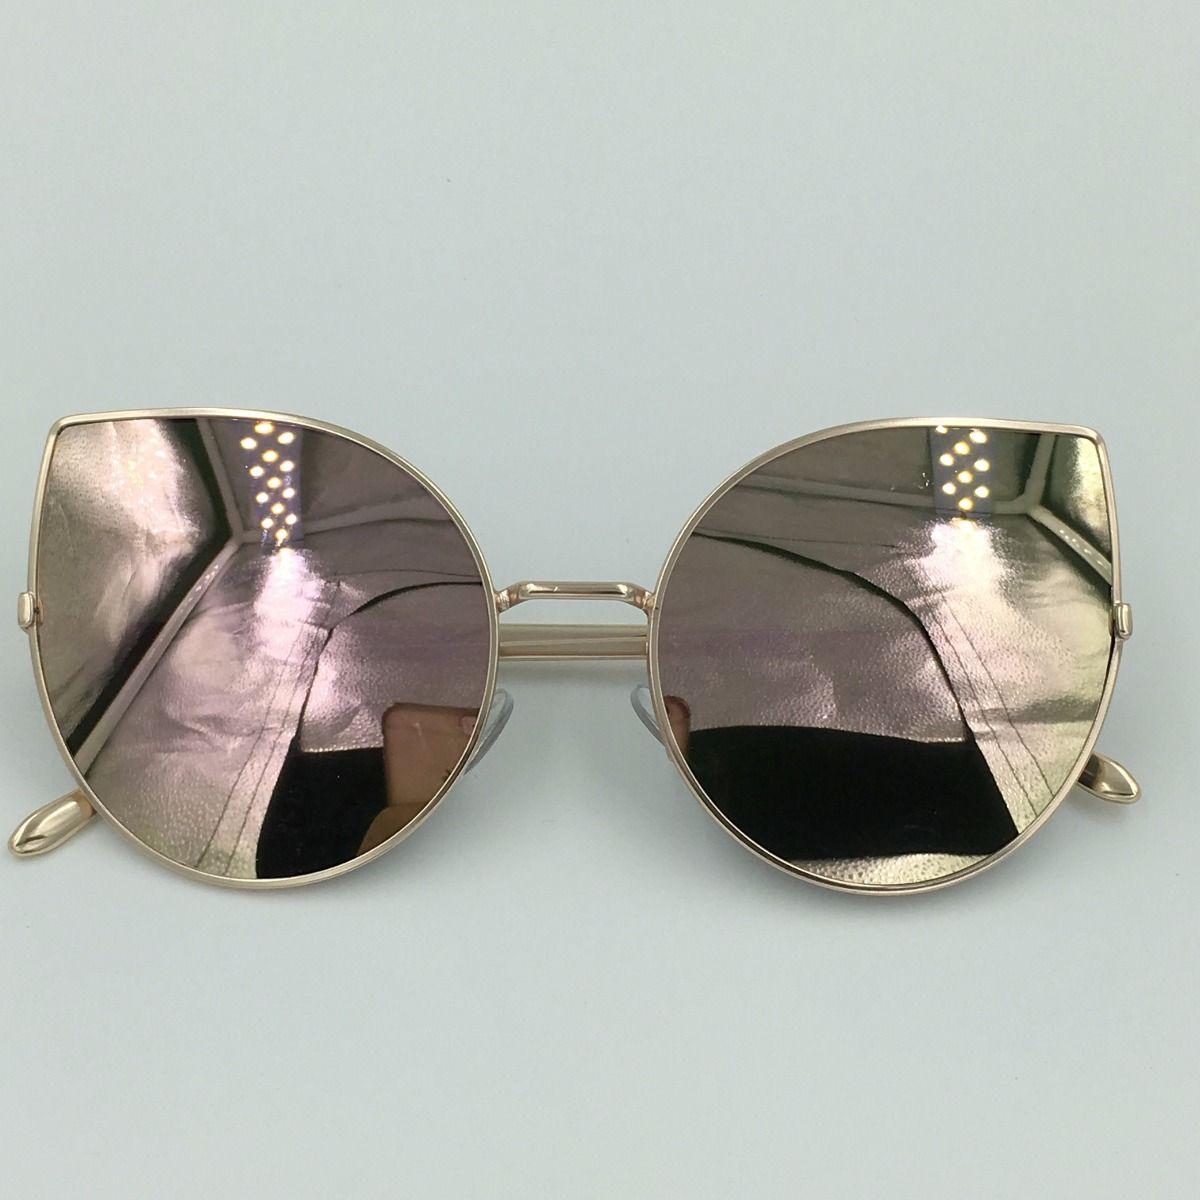 6edbc3408 óculos de sol espelhado feminino gato gatinho metal redondo ...